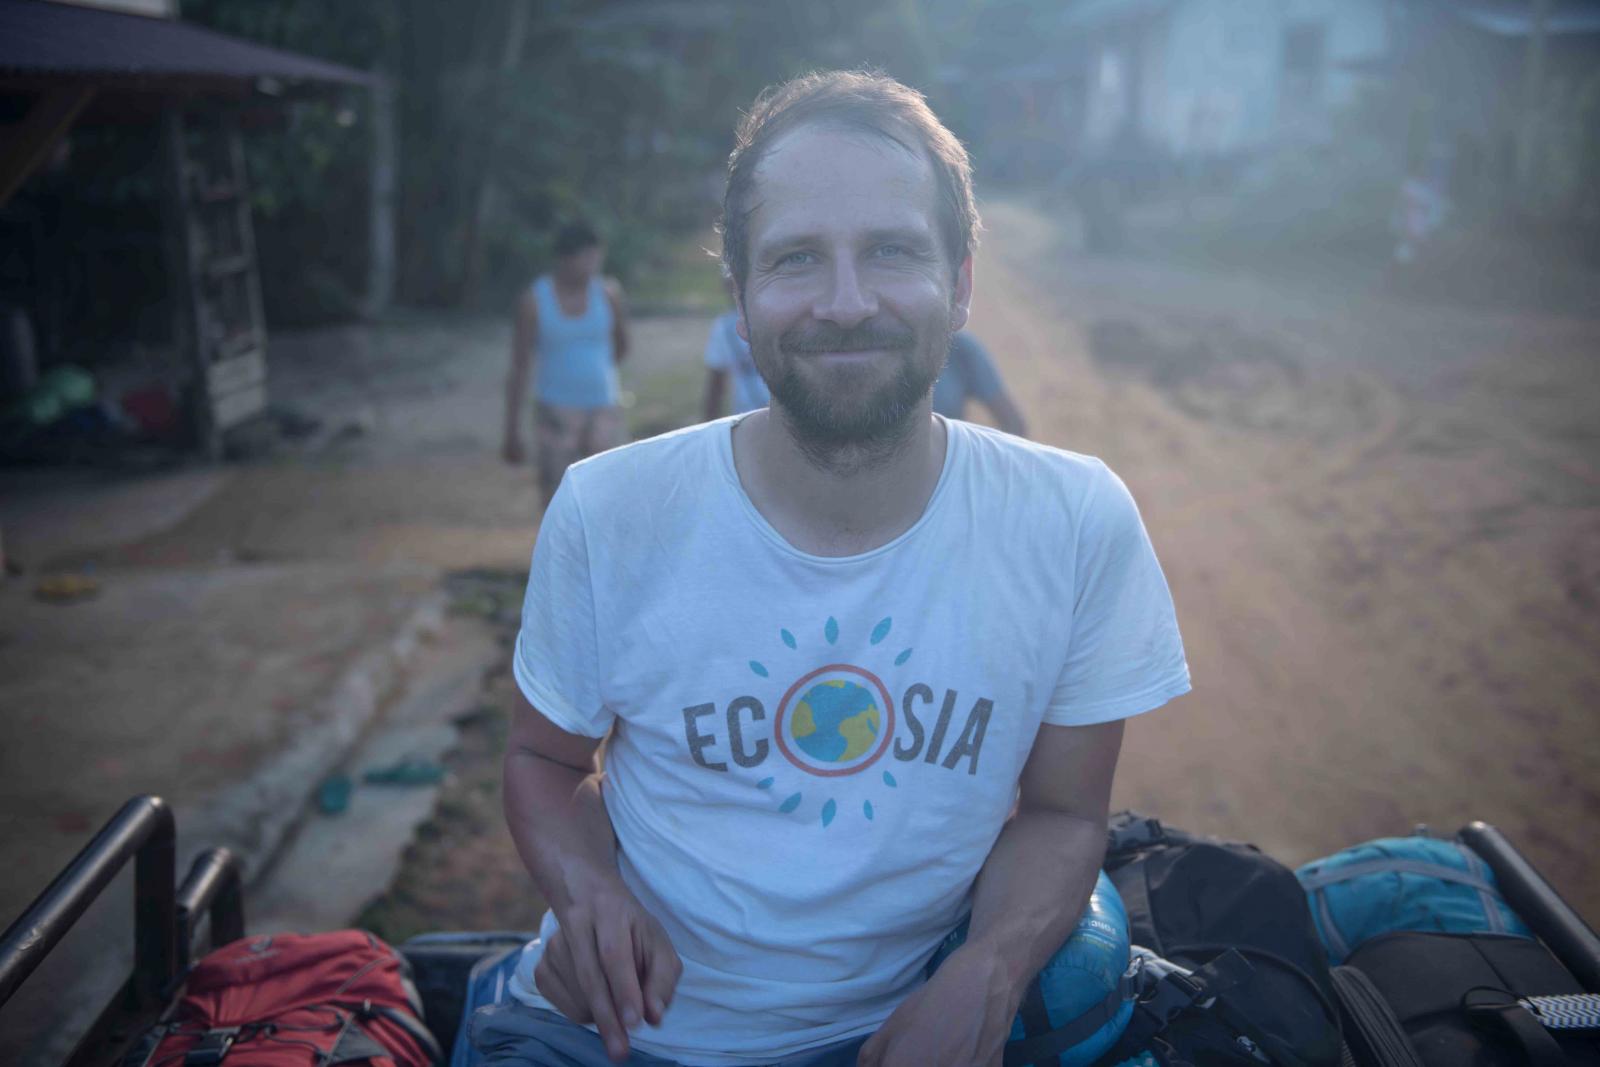 Ecosia's Founder Christian Kroll